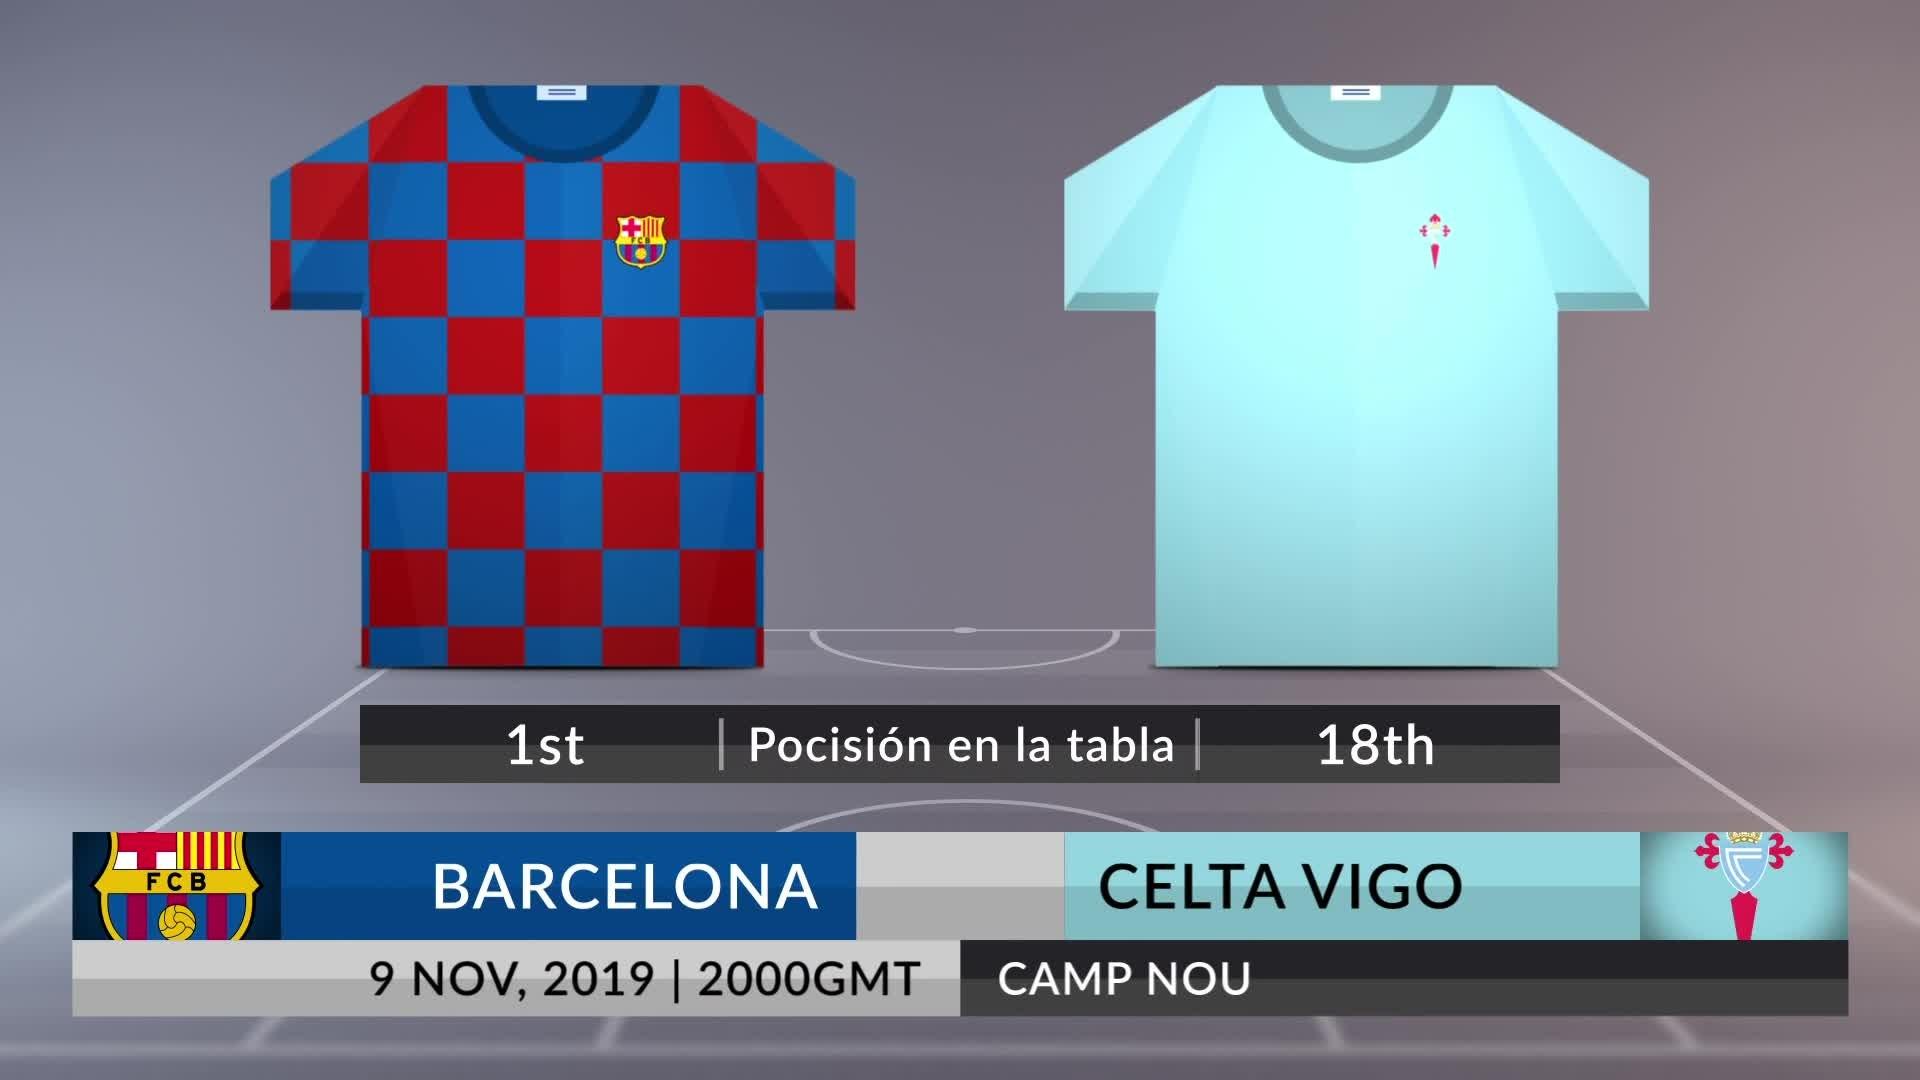 Match Preview: Barcelona vs Celta Vigo on 09/11/2019